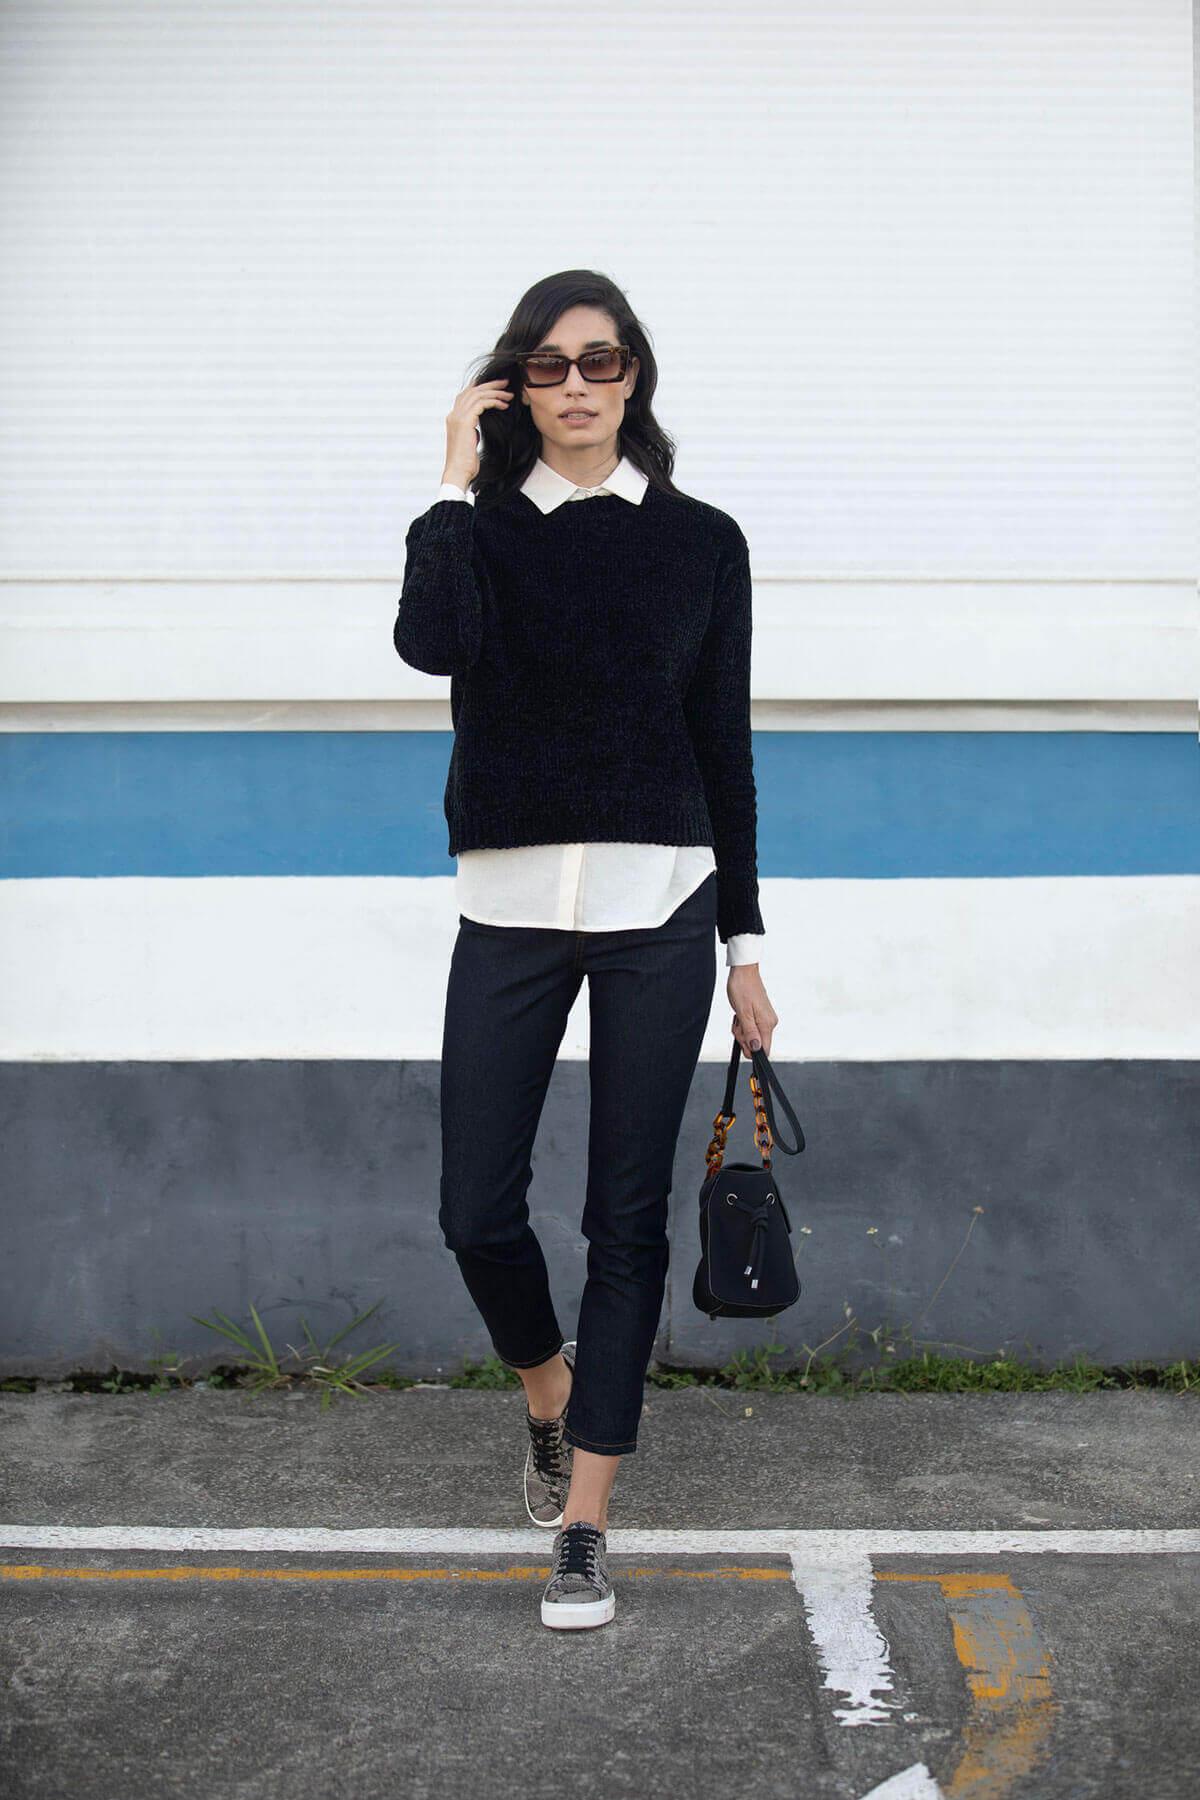 Roupas para trabalhar: look com suéter